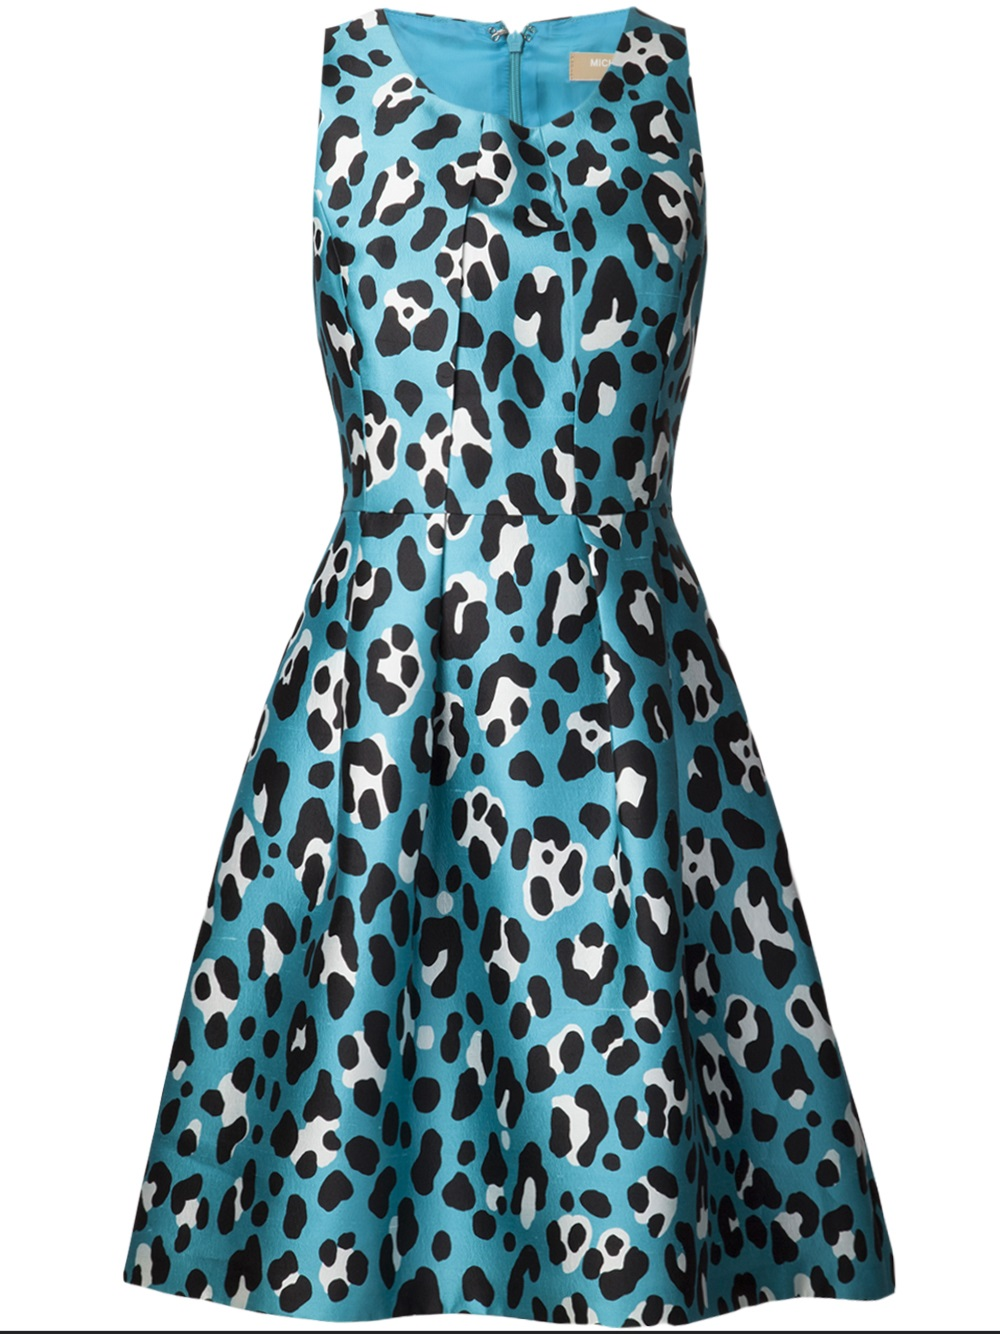 Michael Kors Bell Leopard Print Dress In Blue Lyst